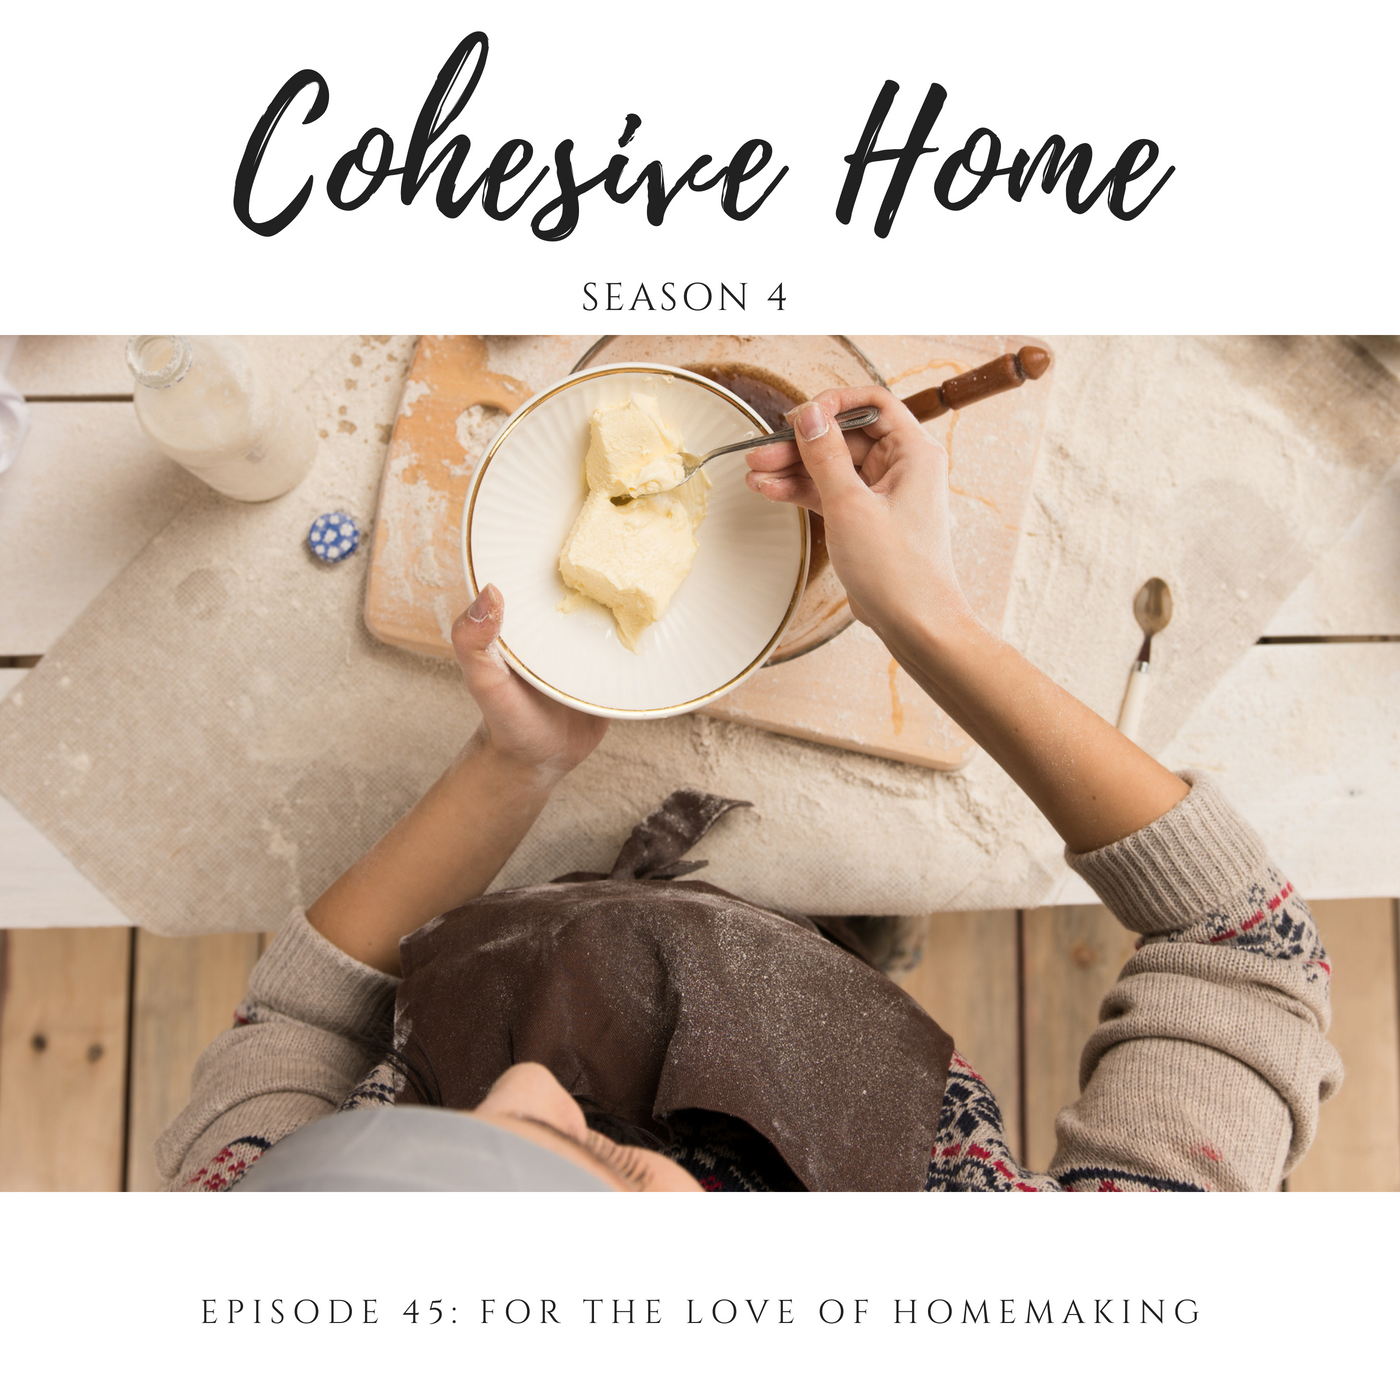 cohesivehome.com